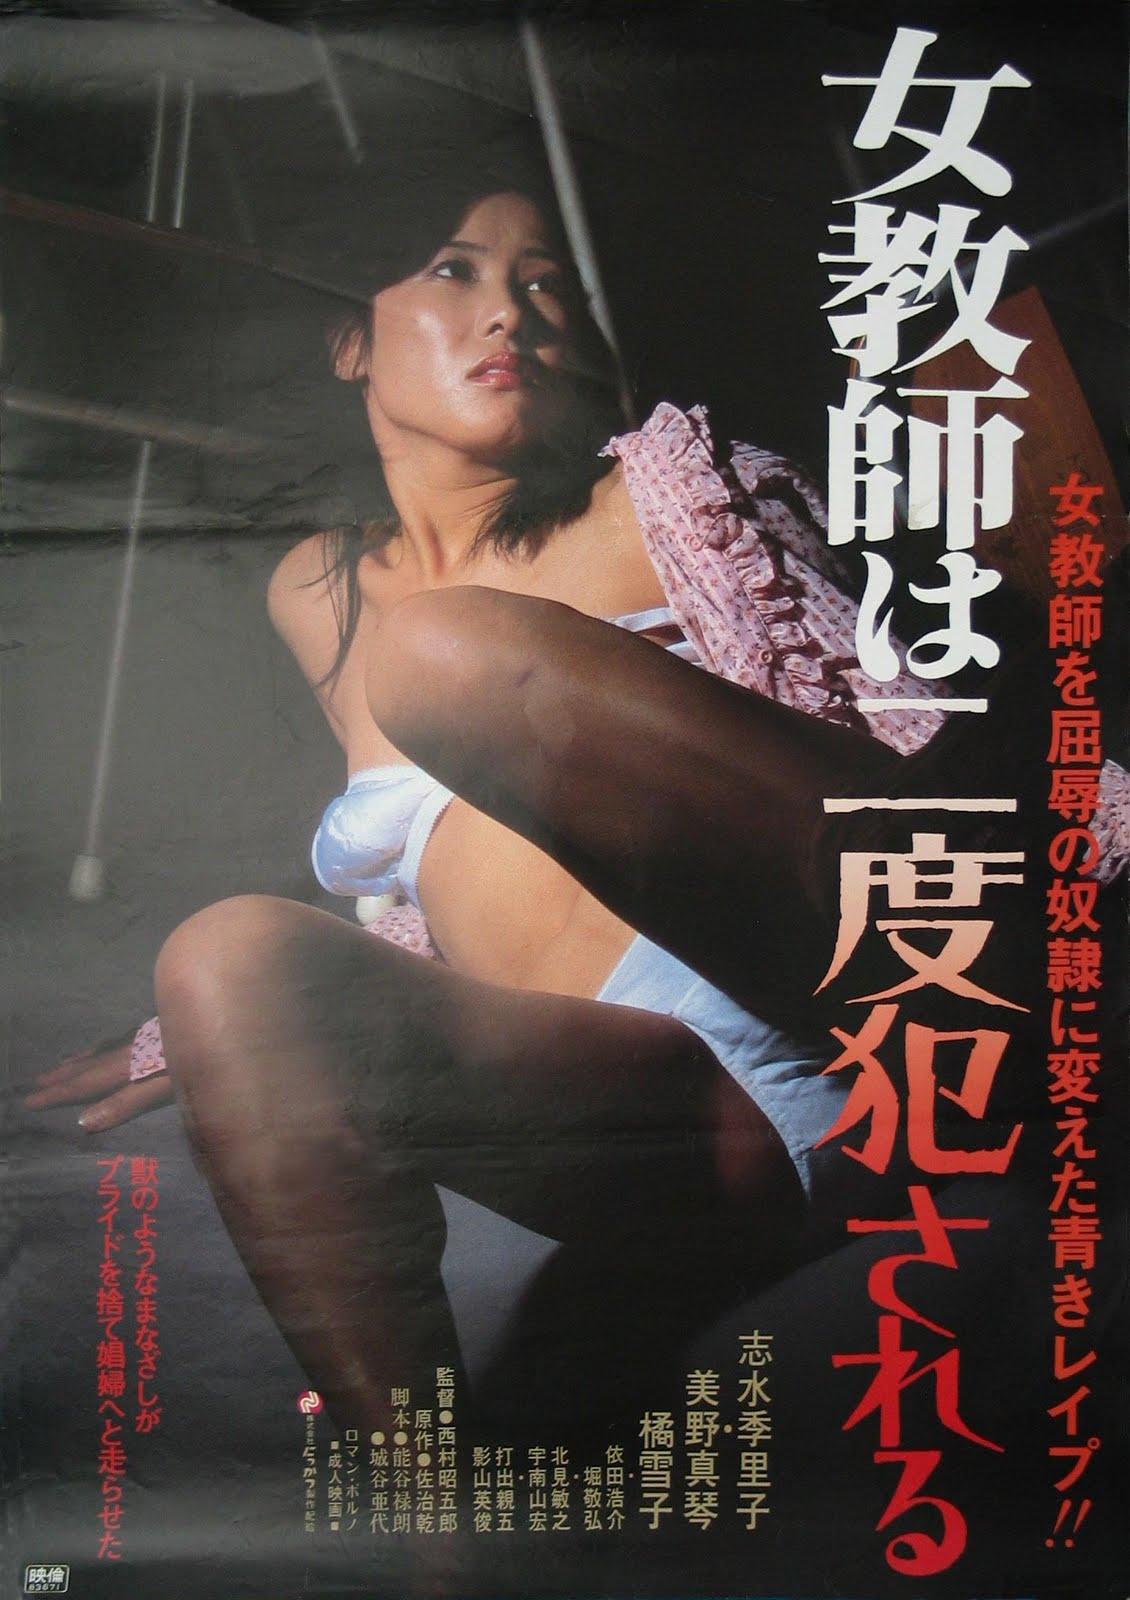 Greatest Films of 1990  Filmsiteorg